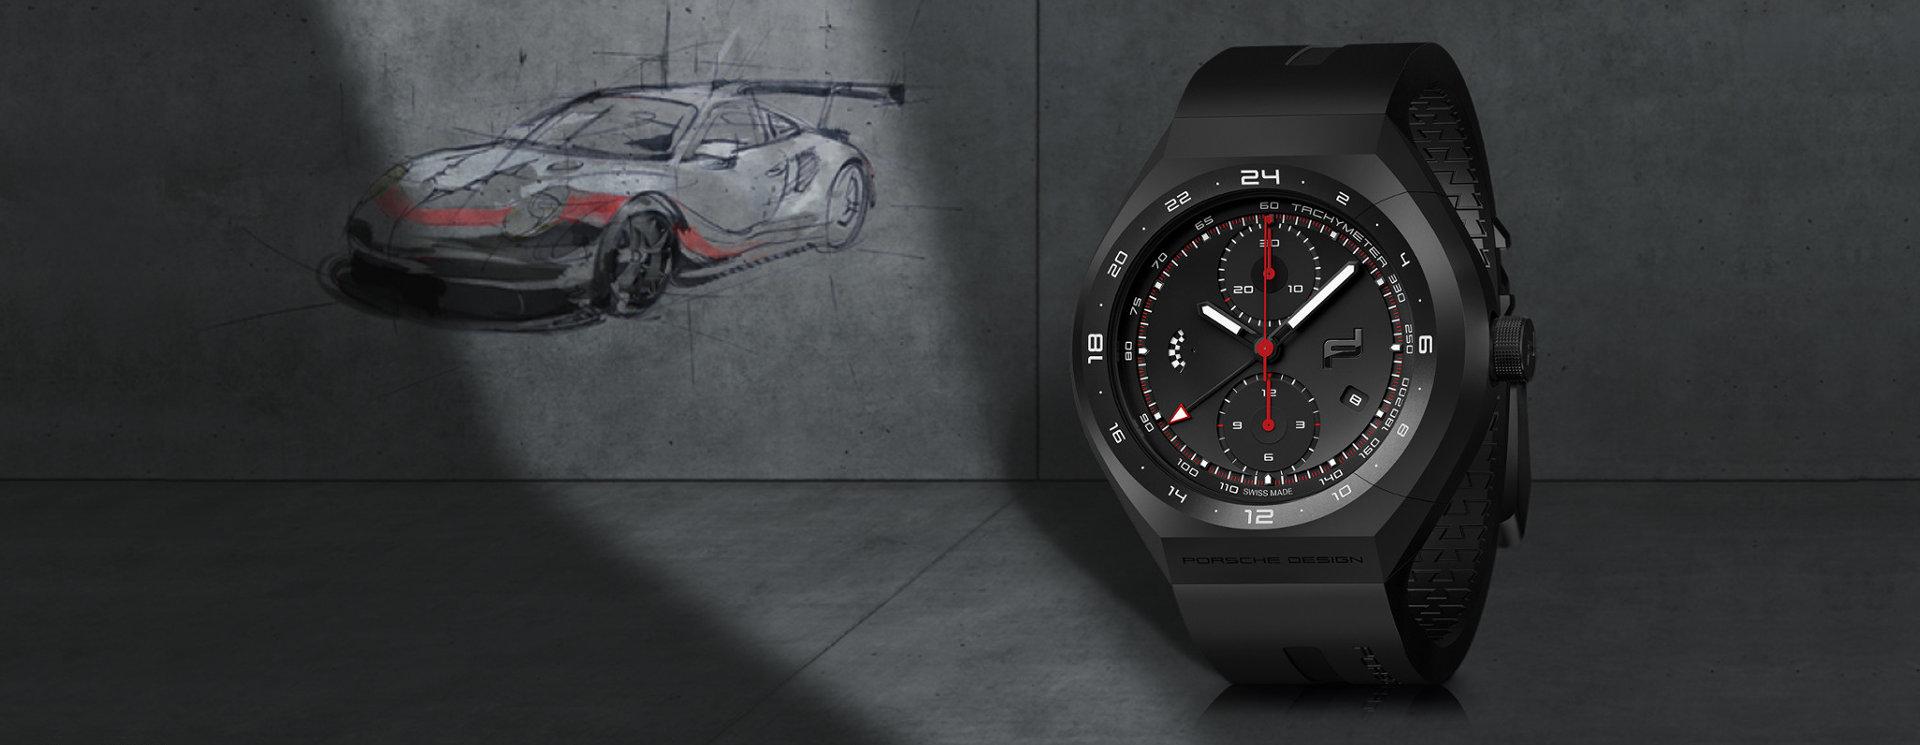 Porsche Design Monobloc Actuator Kollektion